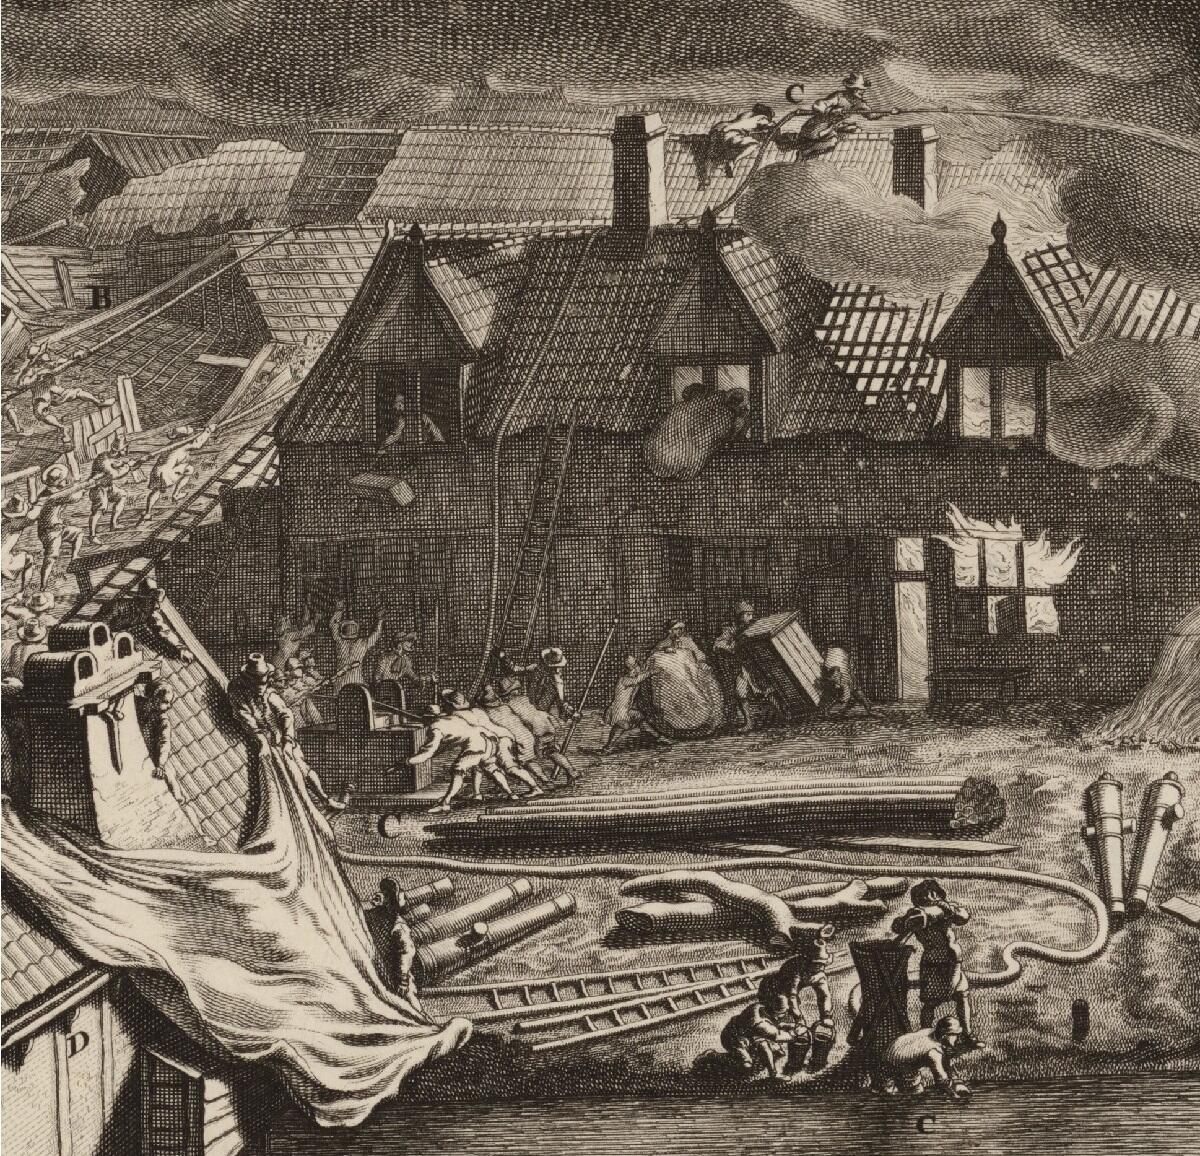 Ян ван дер Хейден, «Пожар на заводе в Амстердаме в 1682 году», фрагмент «Противопожарная машина Яна ван дер Хейдена»